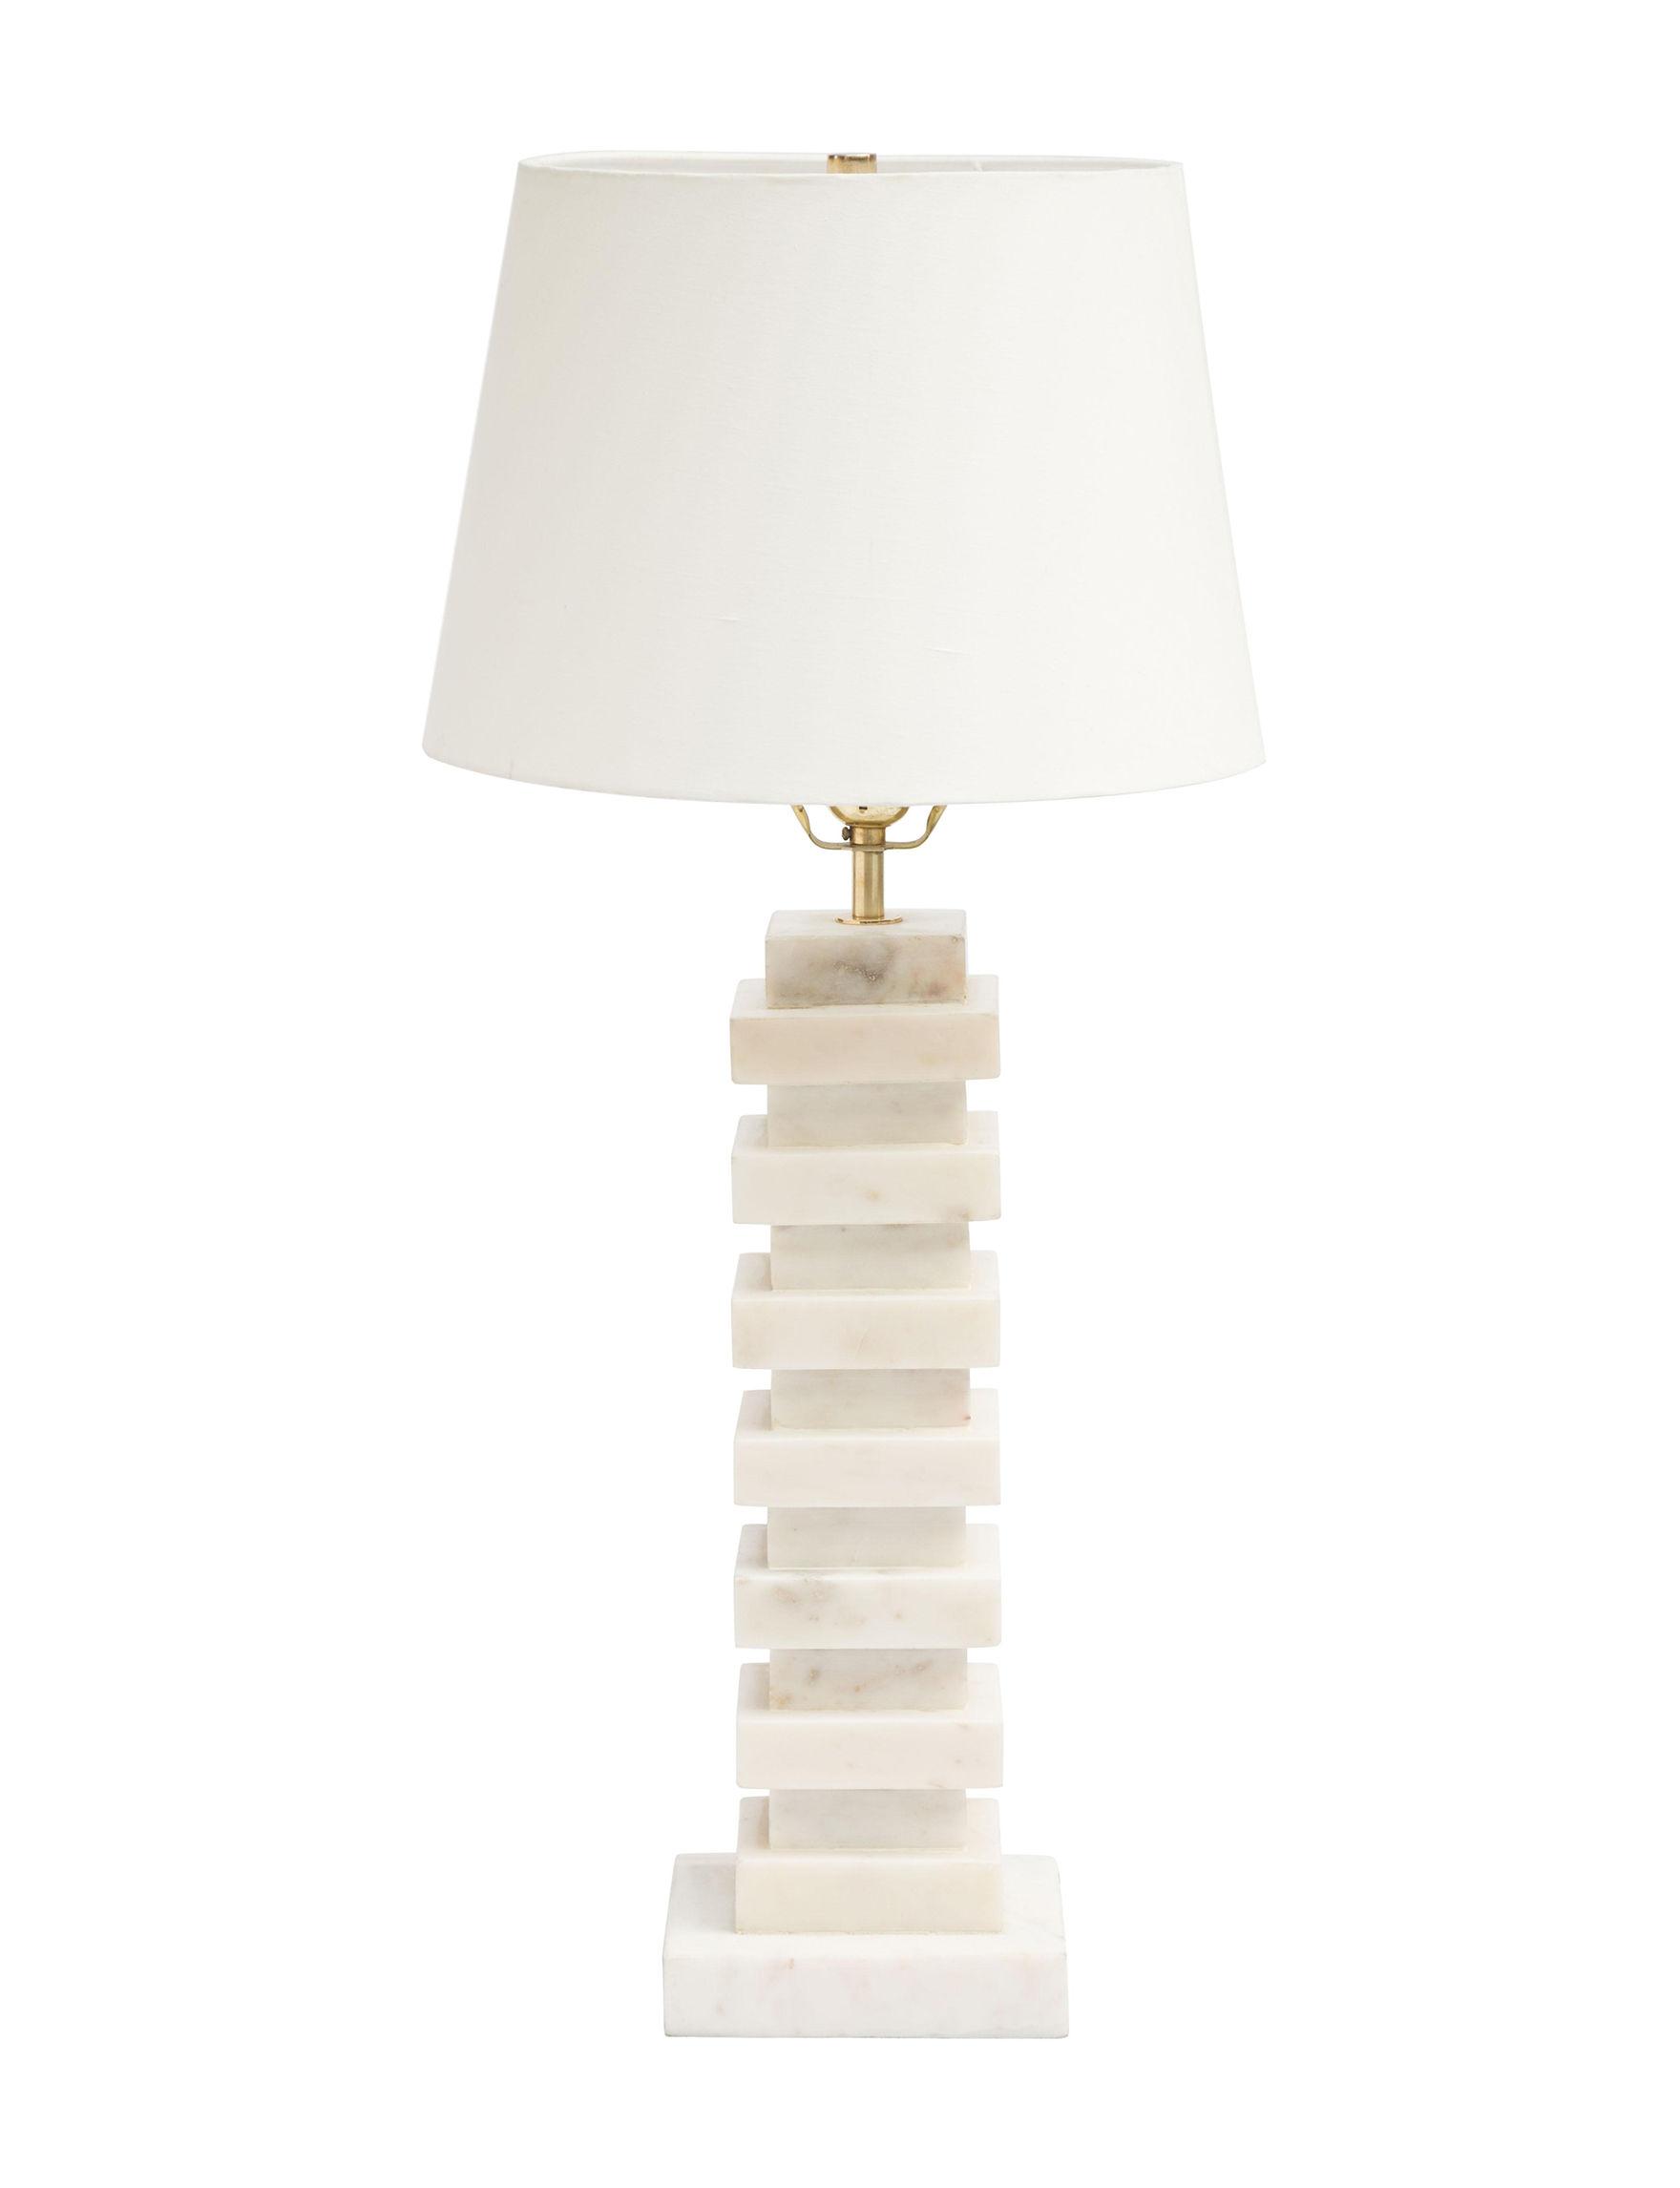 Zuo Modern White Lighting & Lamps